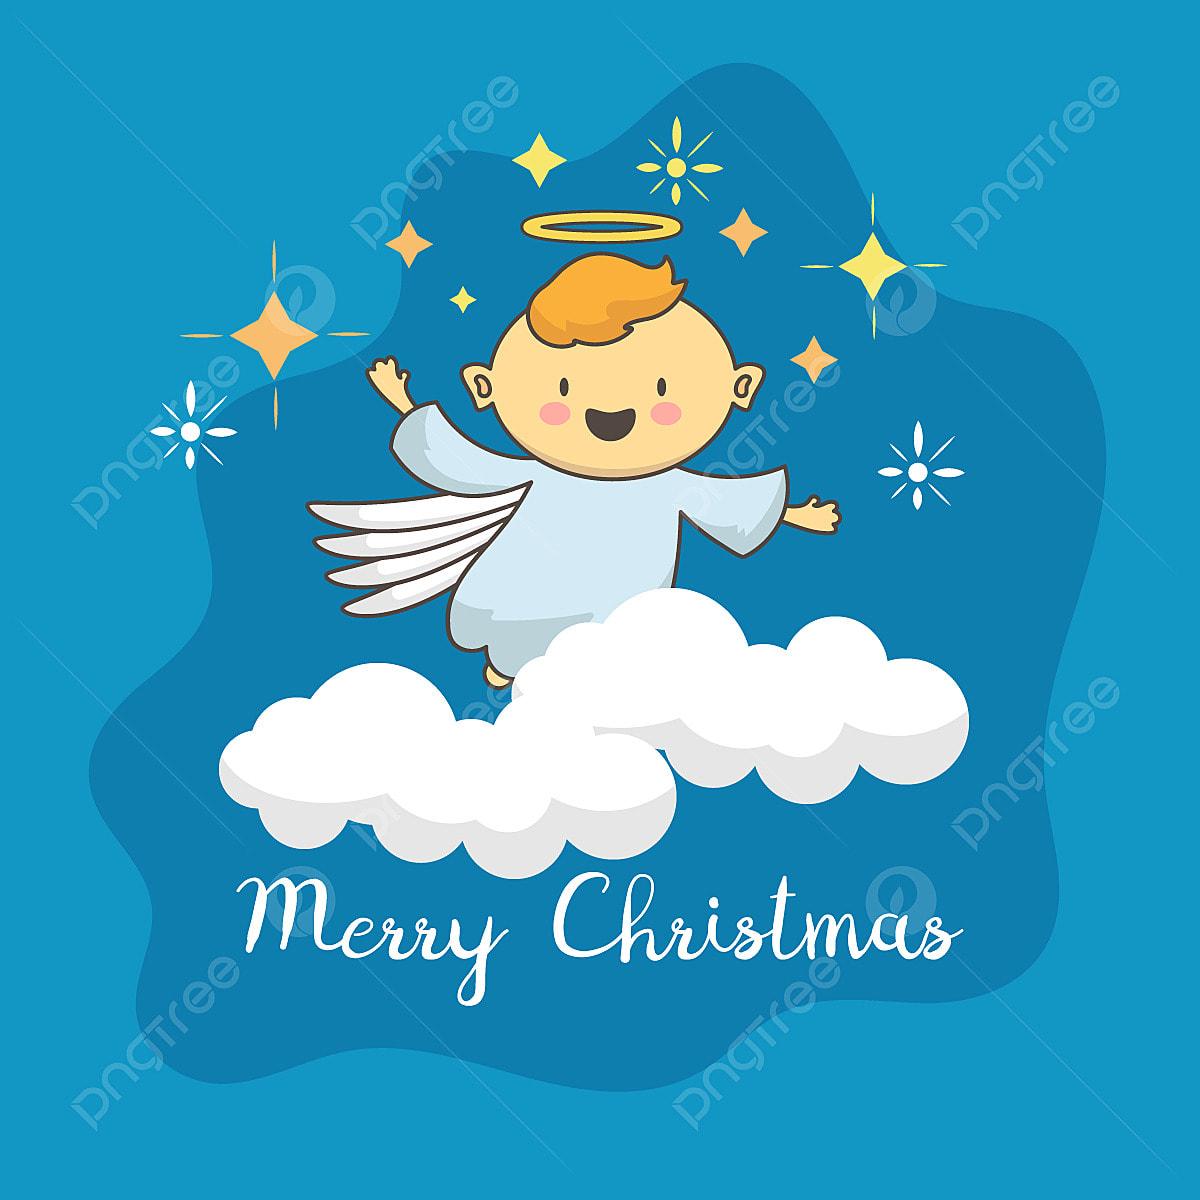 Joli Ange Avec étoile De Noël Contexte Noël Carte De Noël